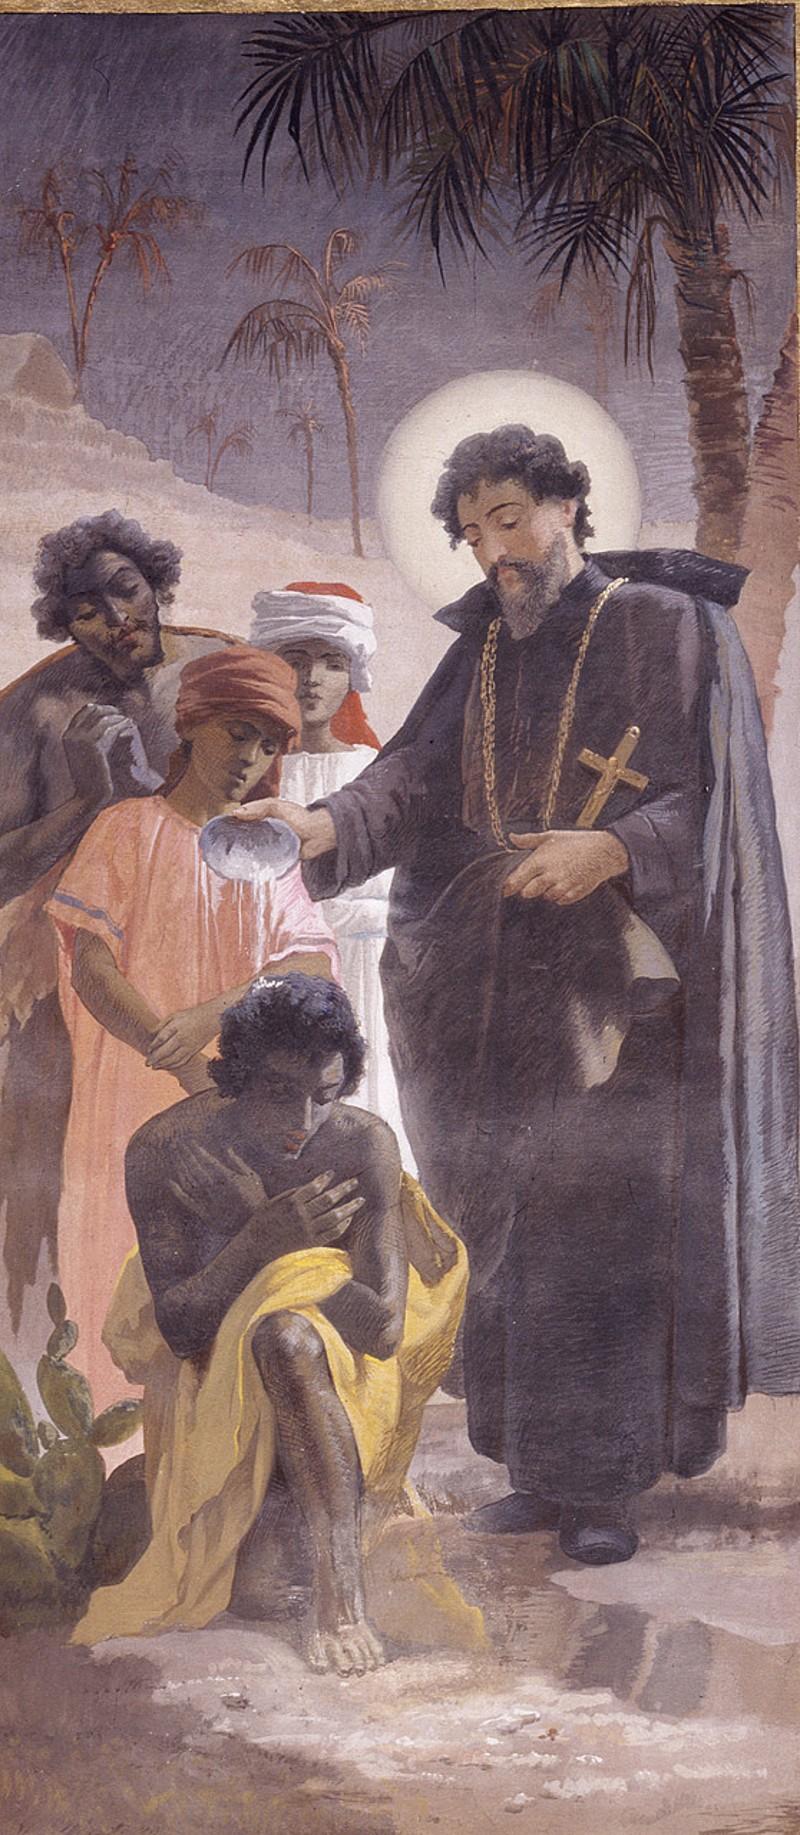 Monti V. (1888-1890), Dipinto murale con San Pietro Claver